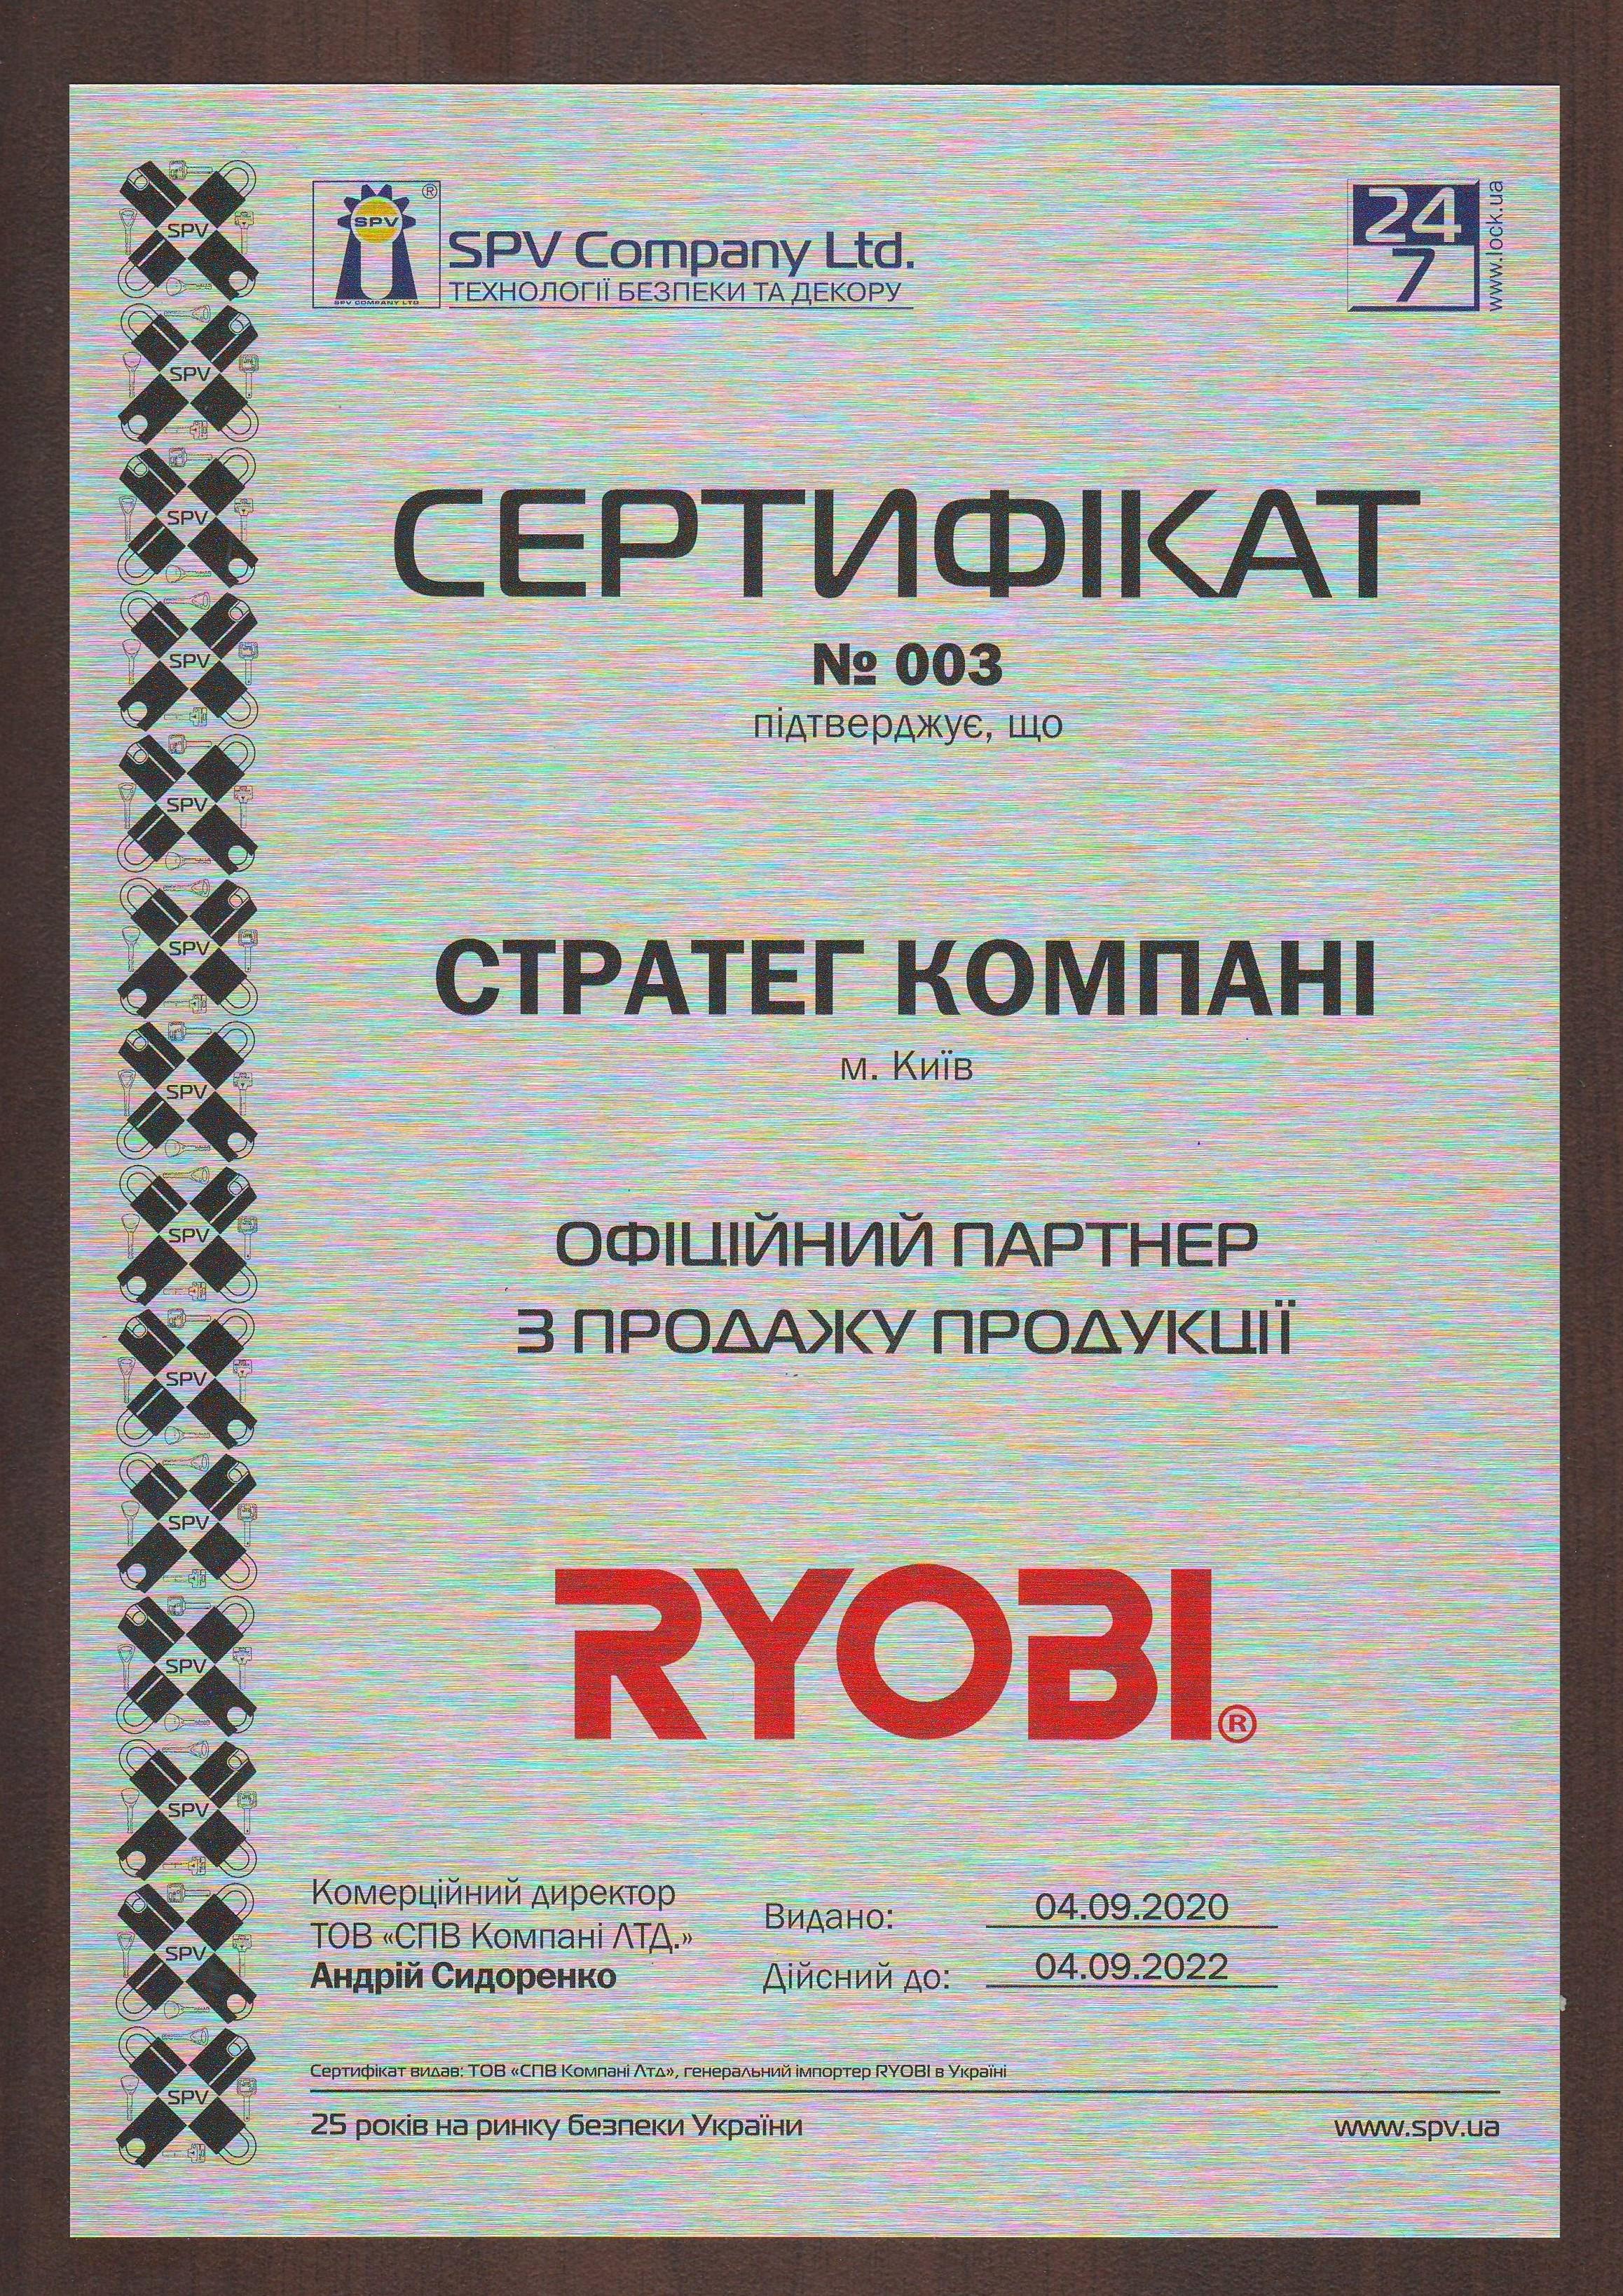 Cертификат RYOBI партнер